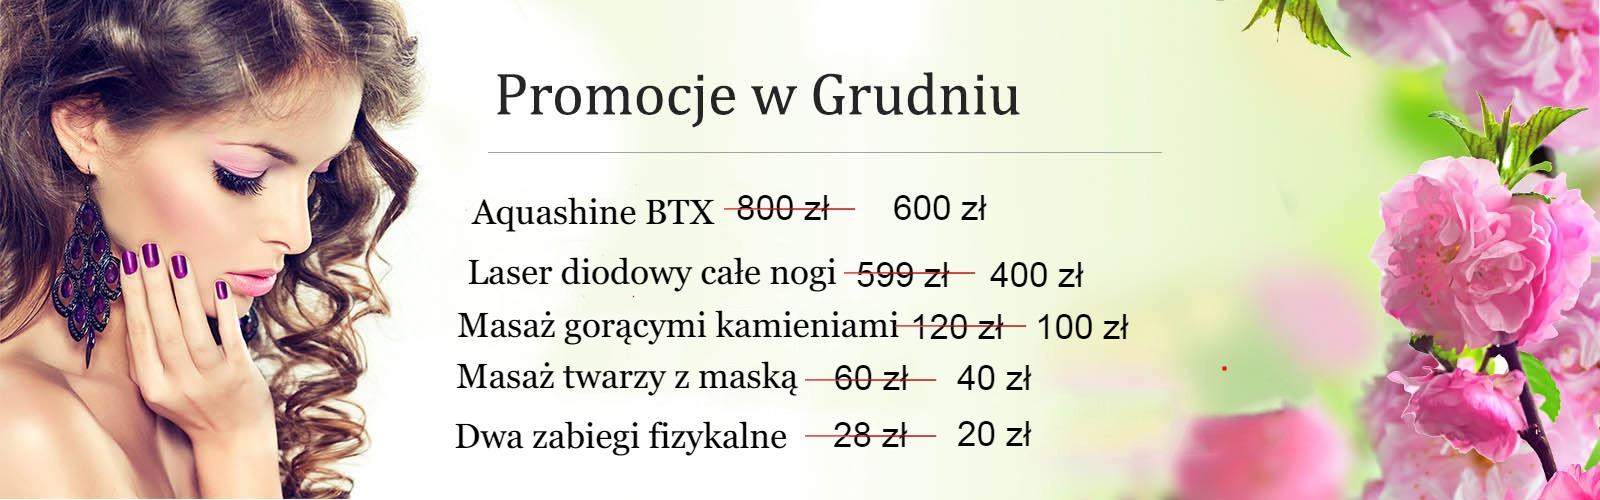 promocje-grudzien-2019